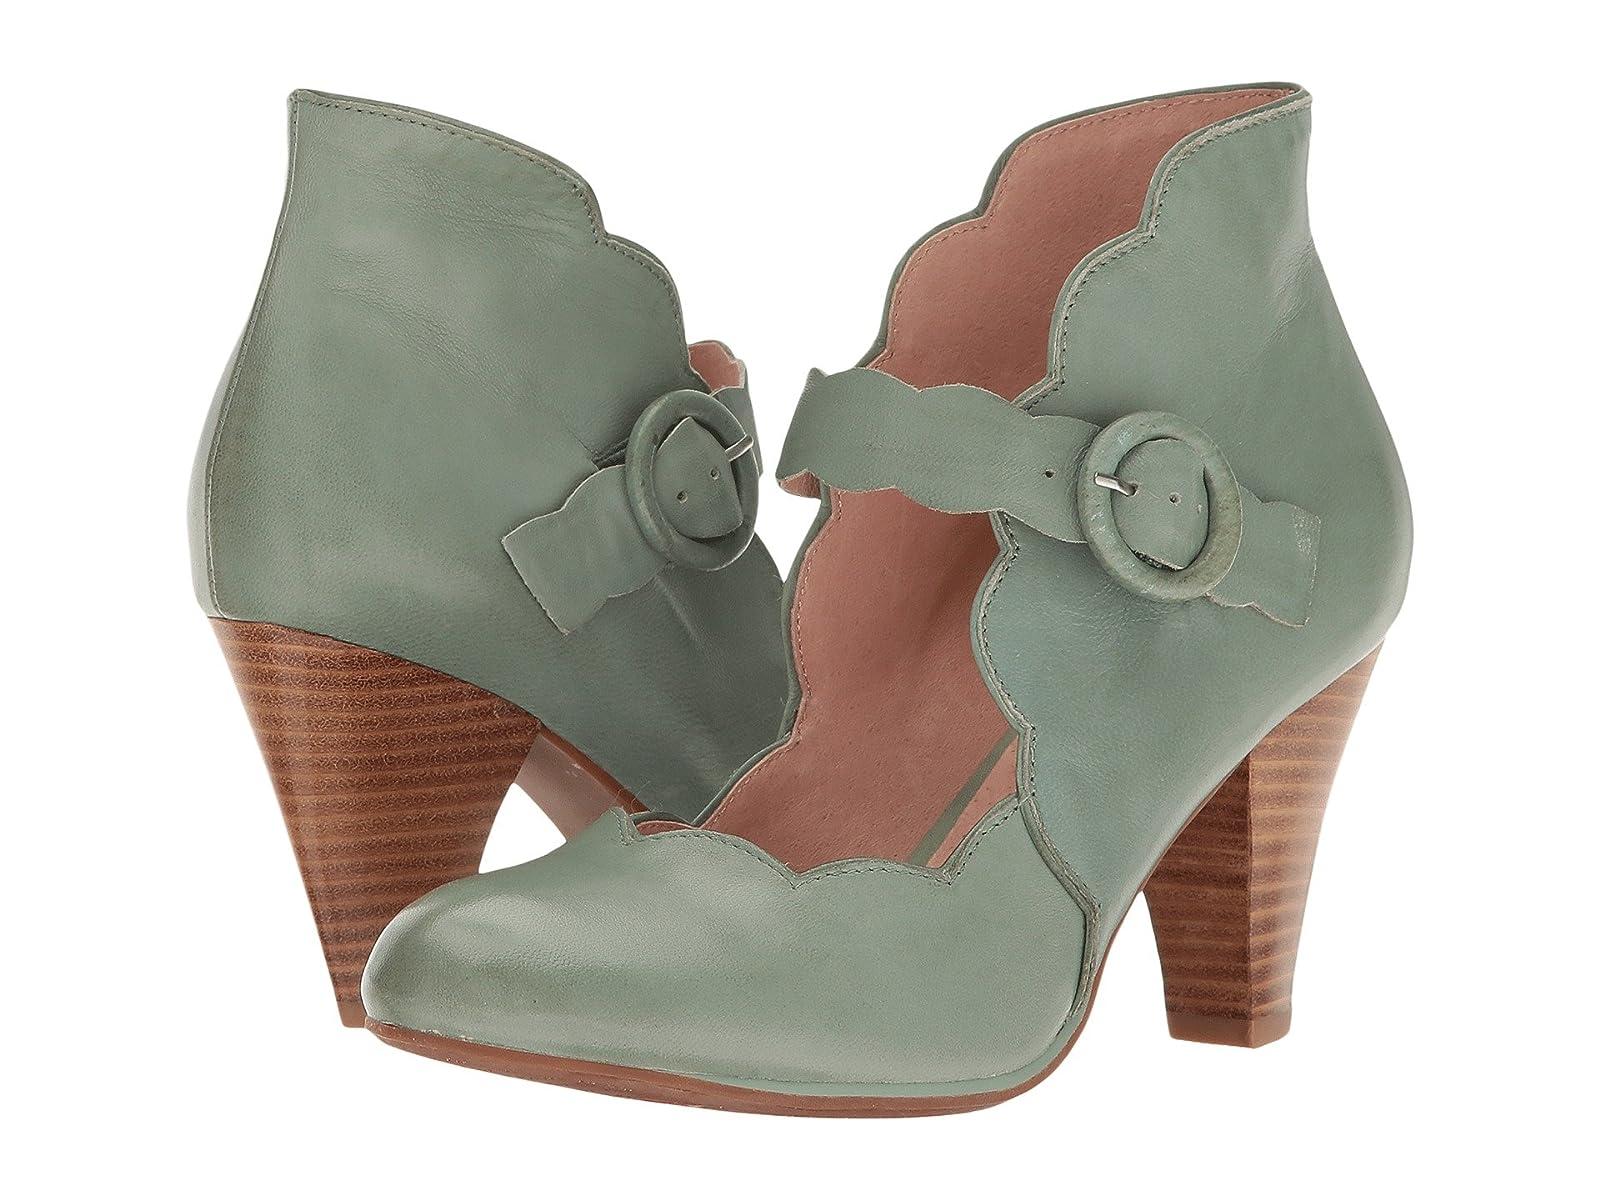 Miz Mooz CarissaAtmospheric grades have affordable shoes